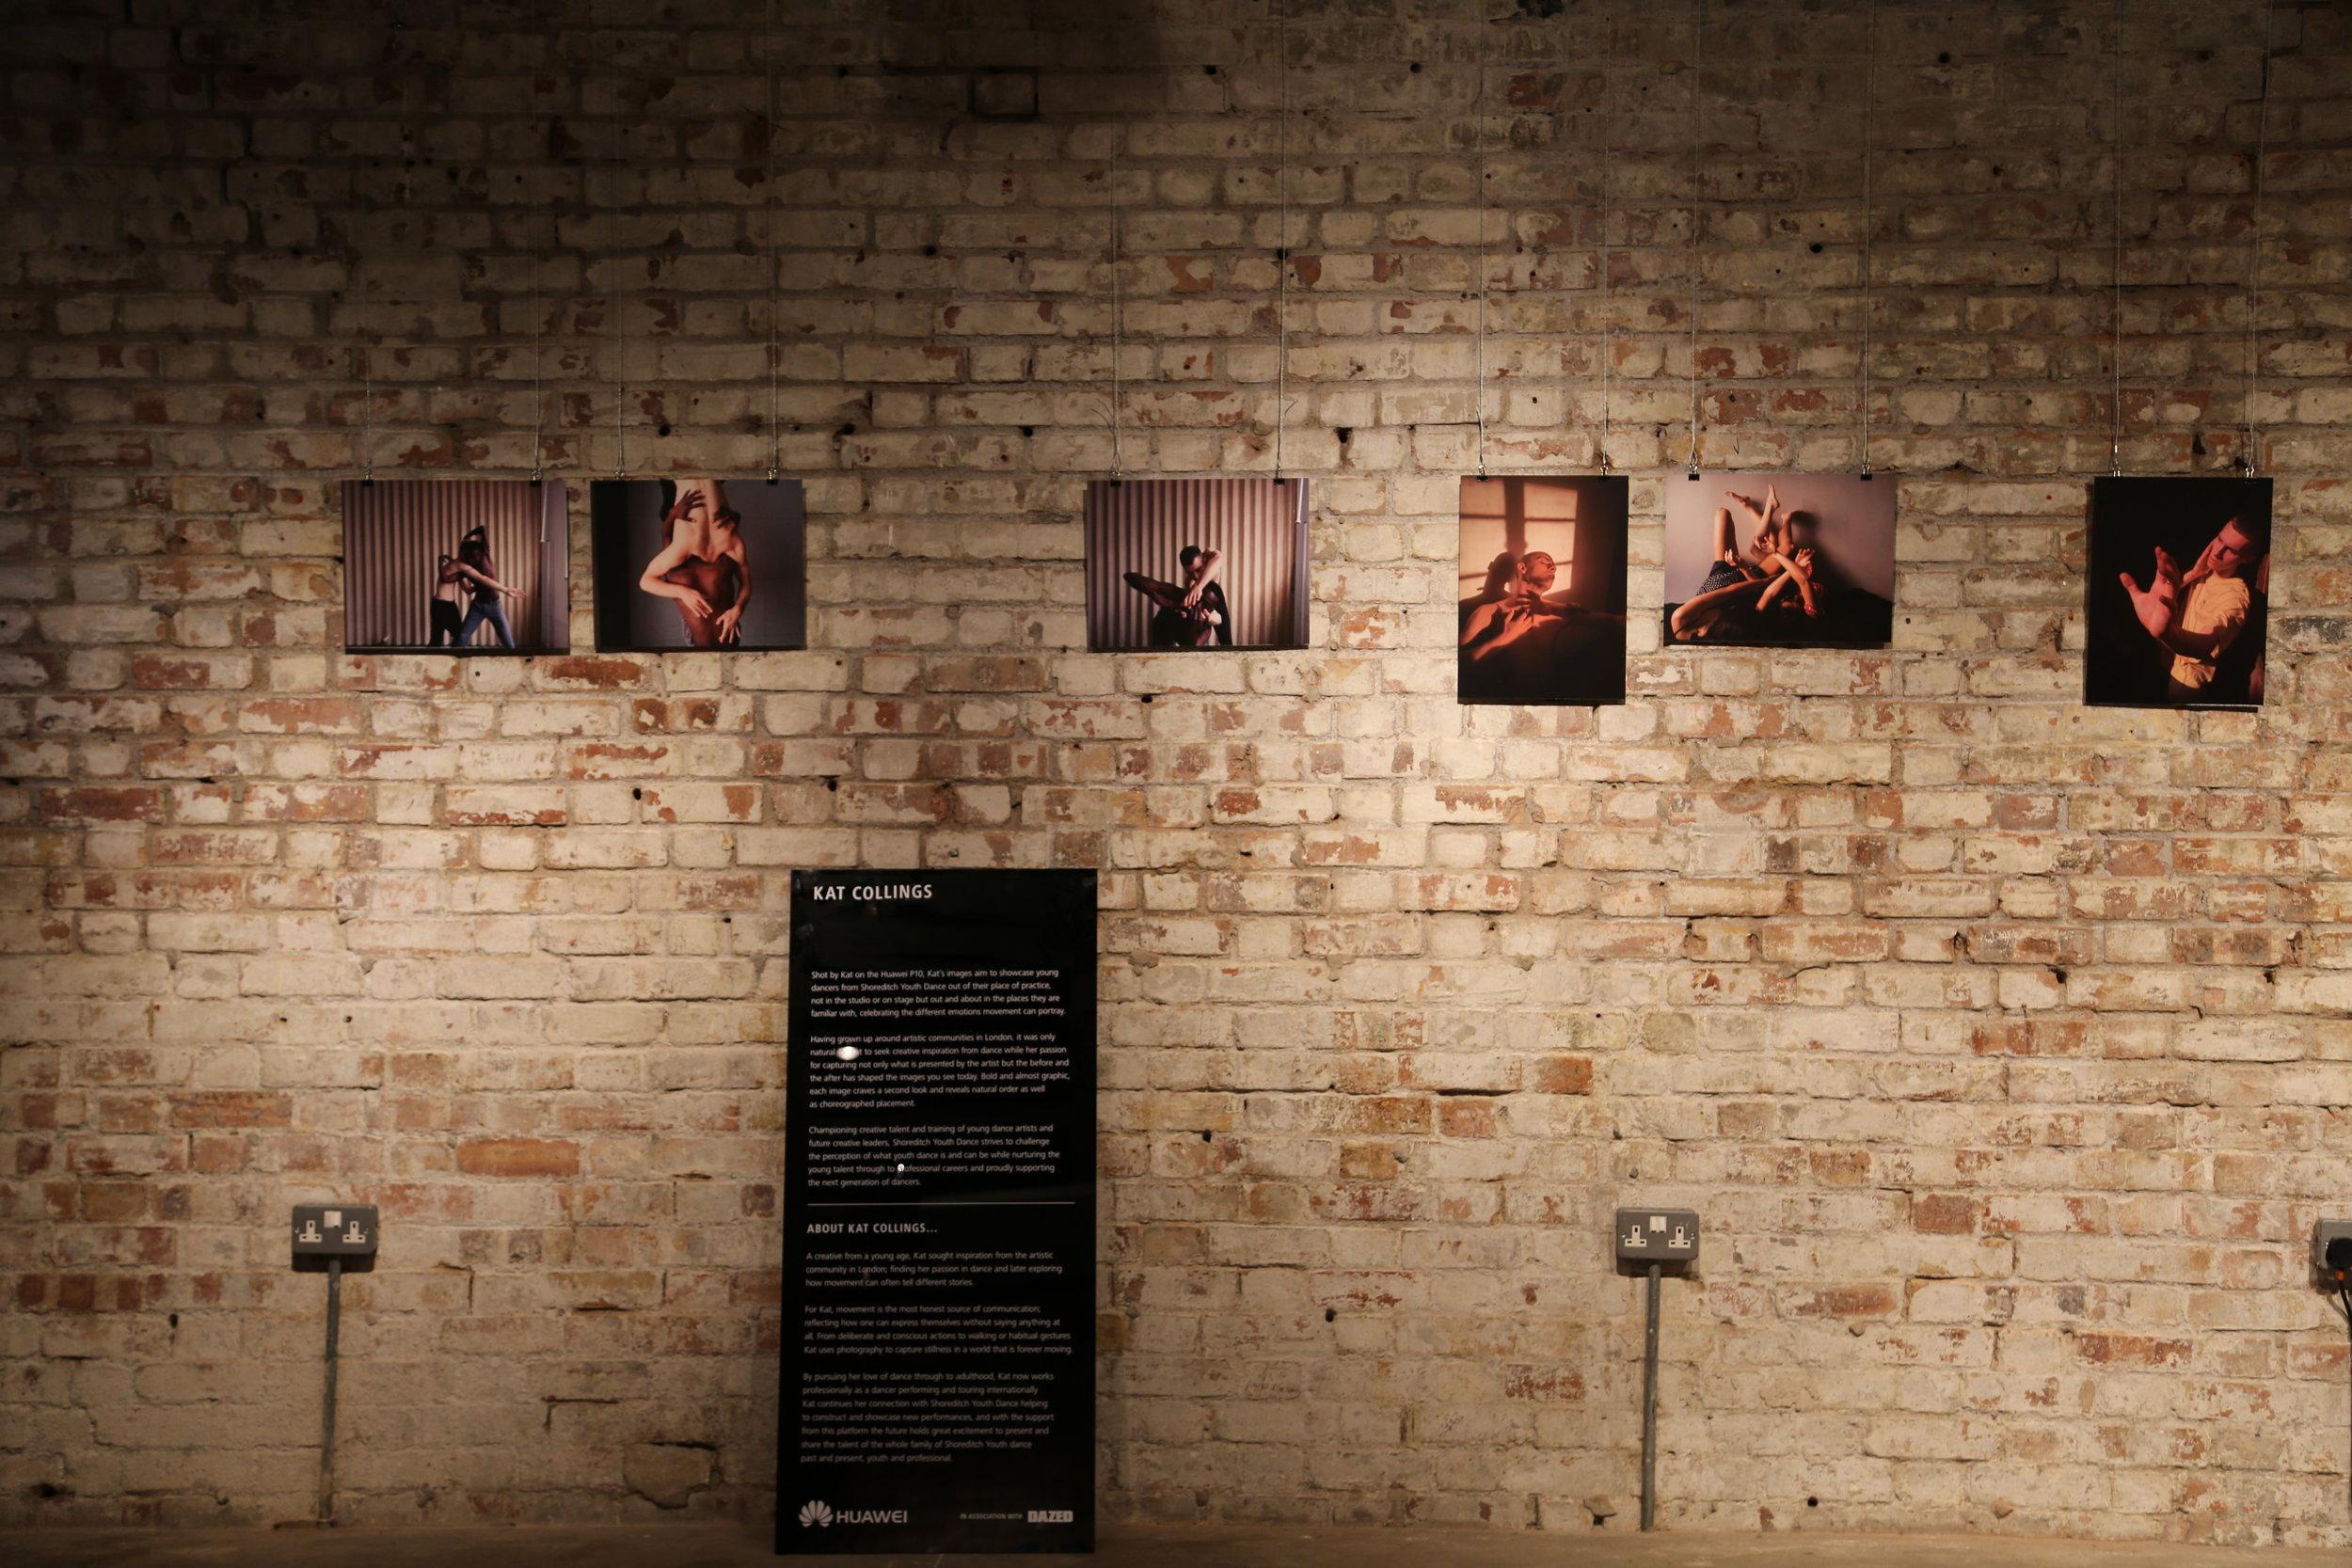 Huawei Exhibition Design